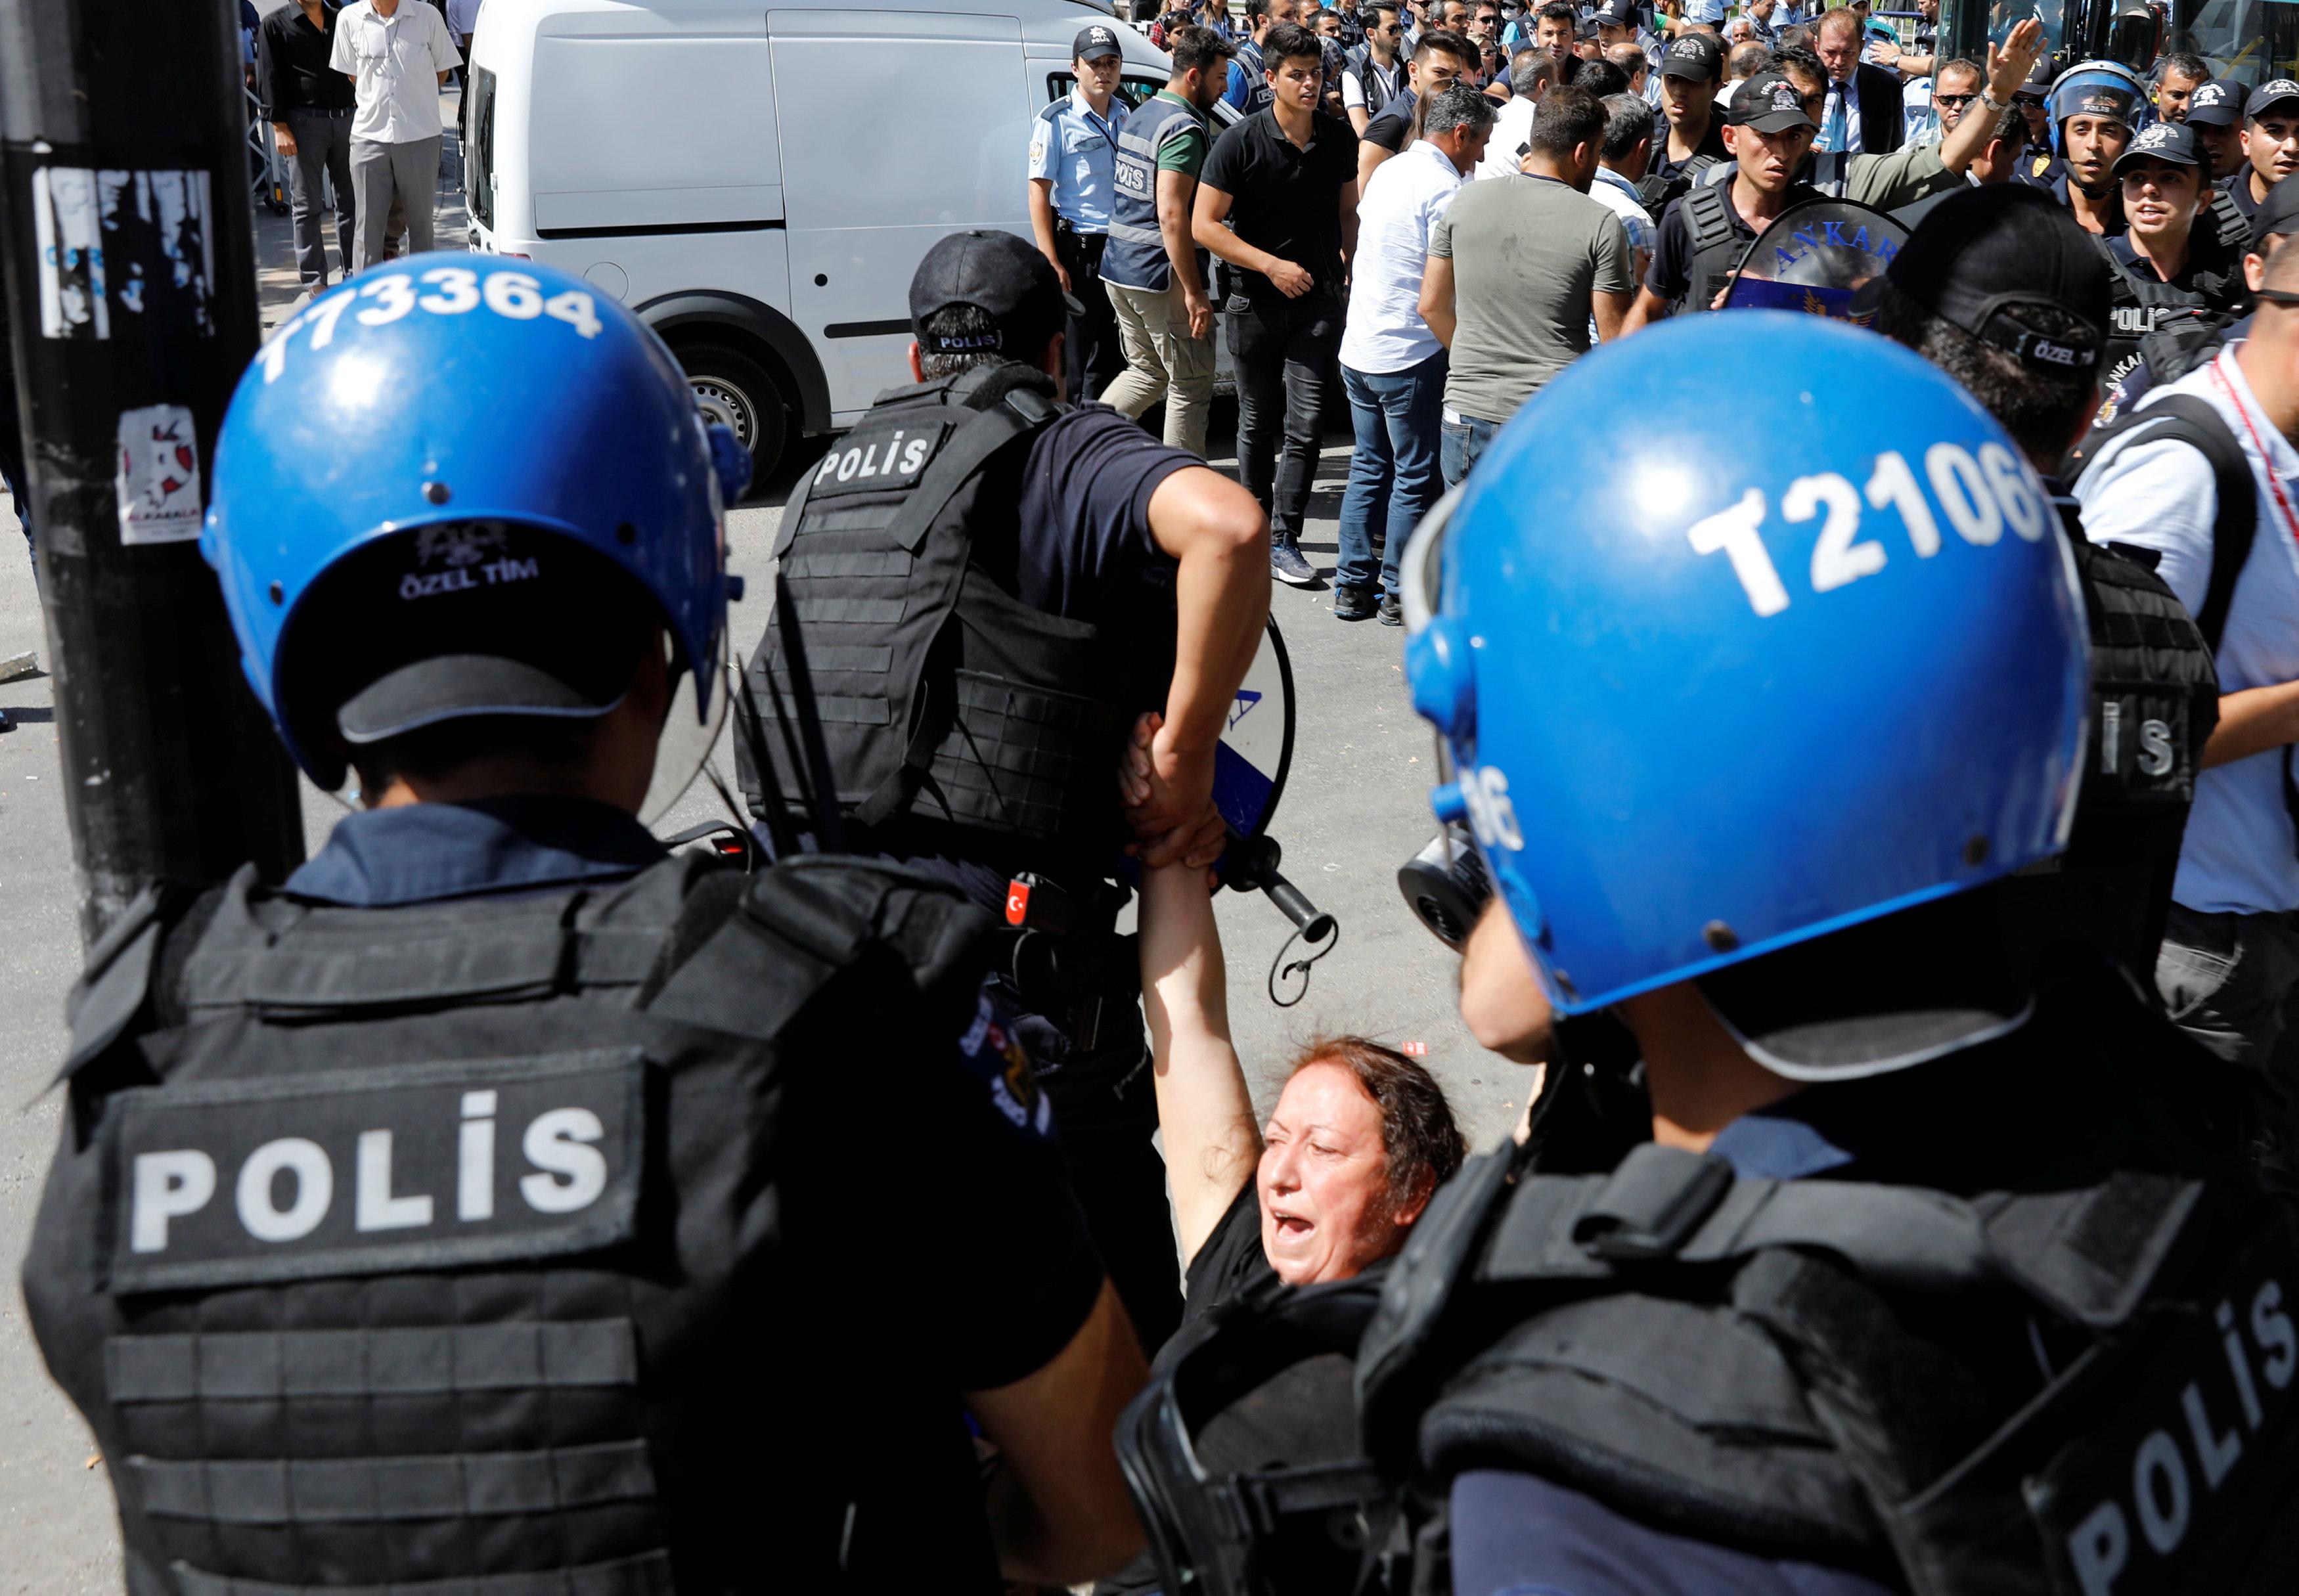 2017 09 14T115938Z 1711438251 RC11984FA750 RTRMADP 3 TURKEY SECURITY TRIAL